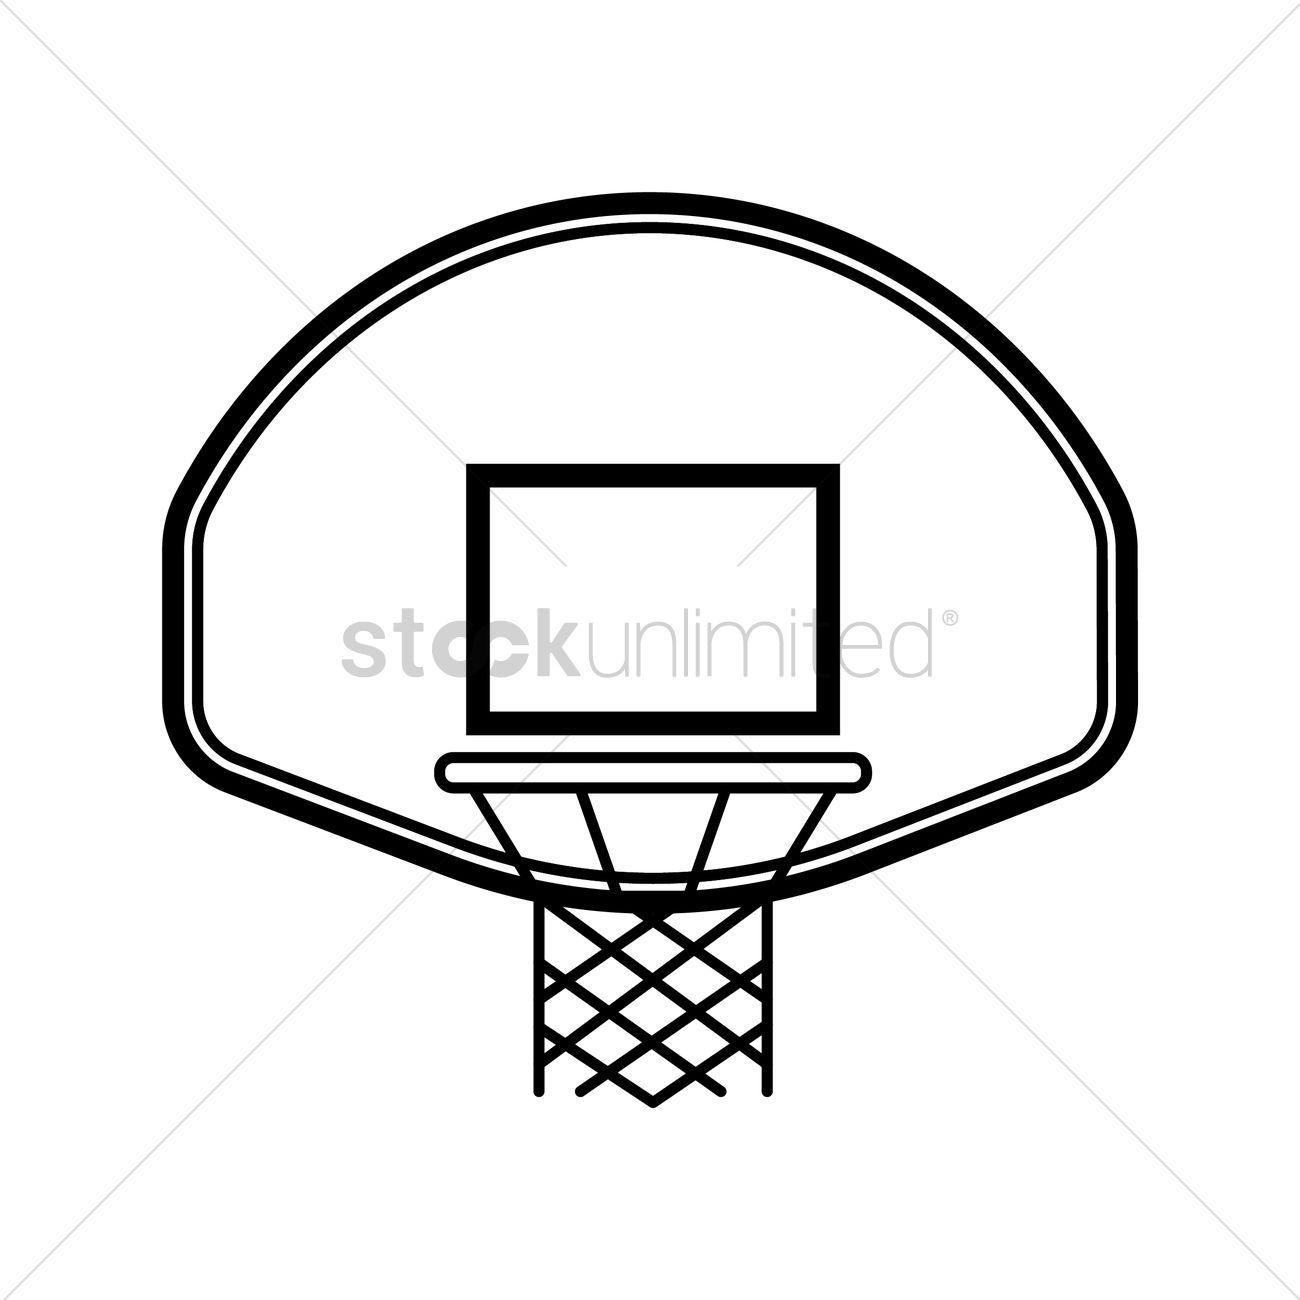 Basketball backboard and rim Vector Image - 1984720 ...